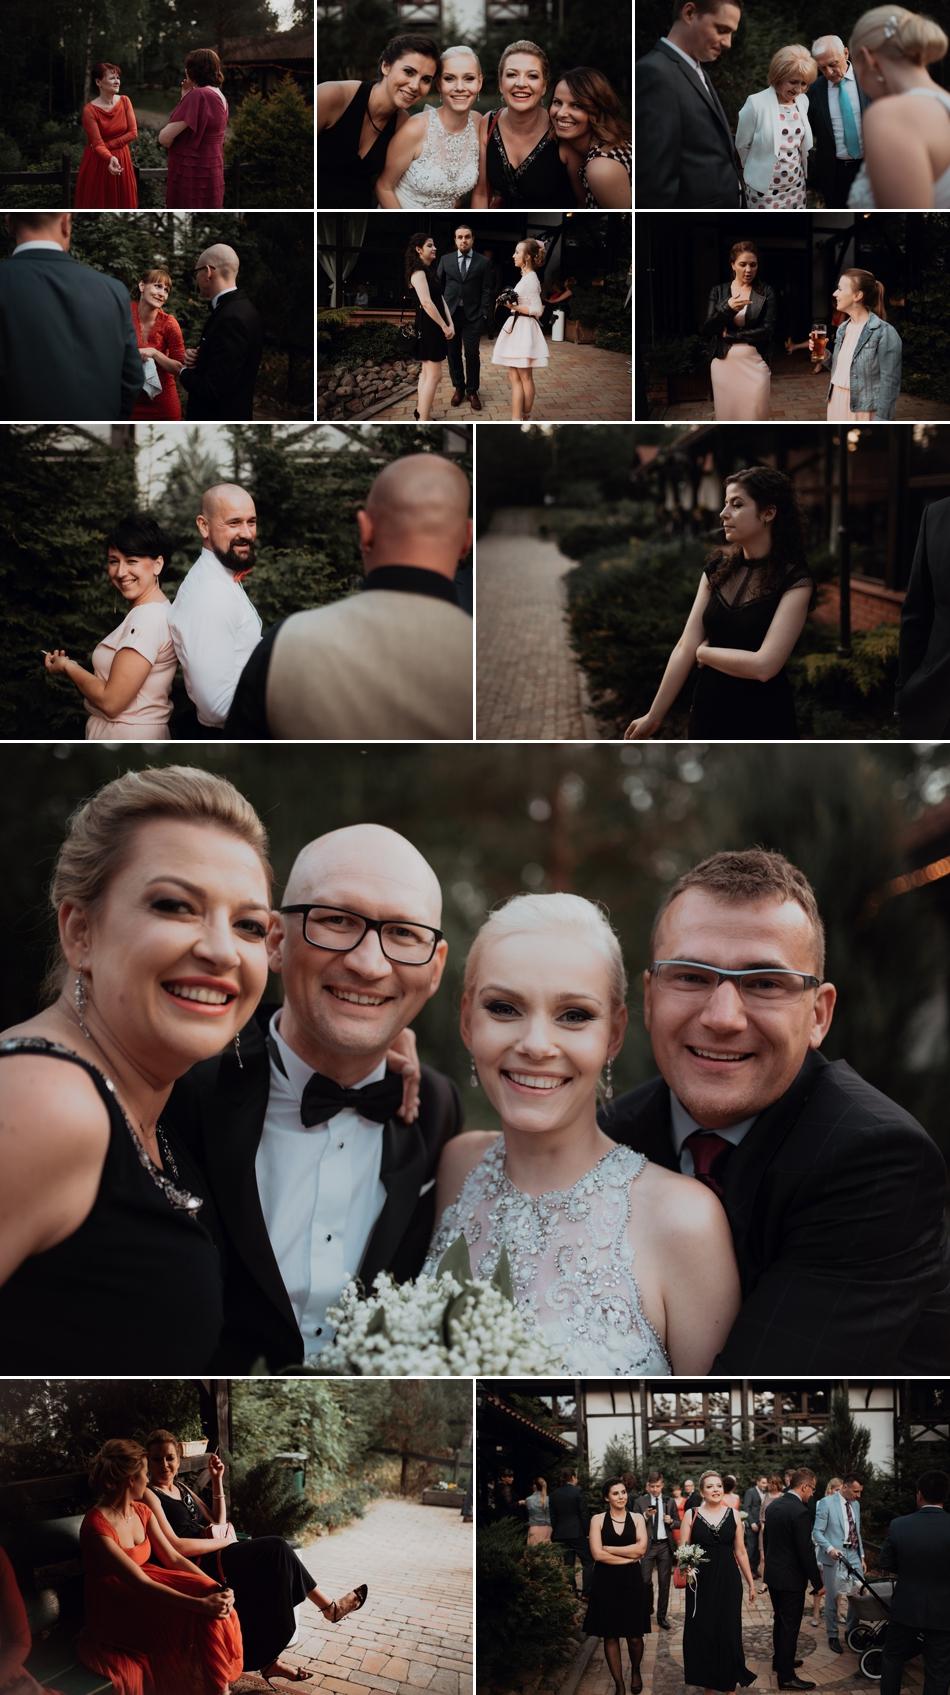 wedding-photographer-zukography-destination133.jpg